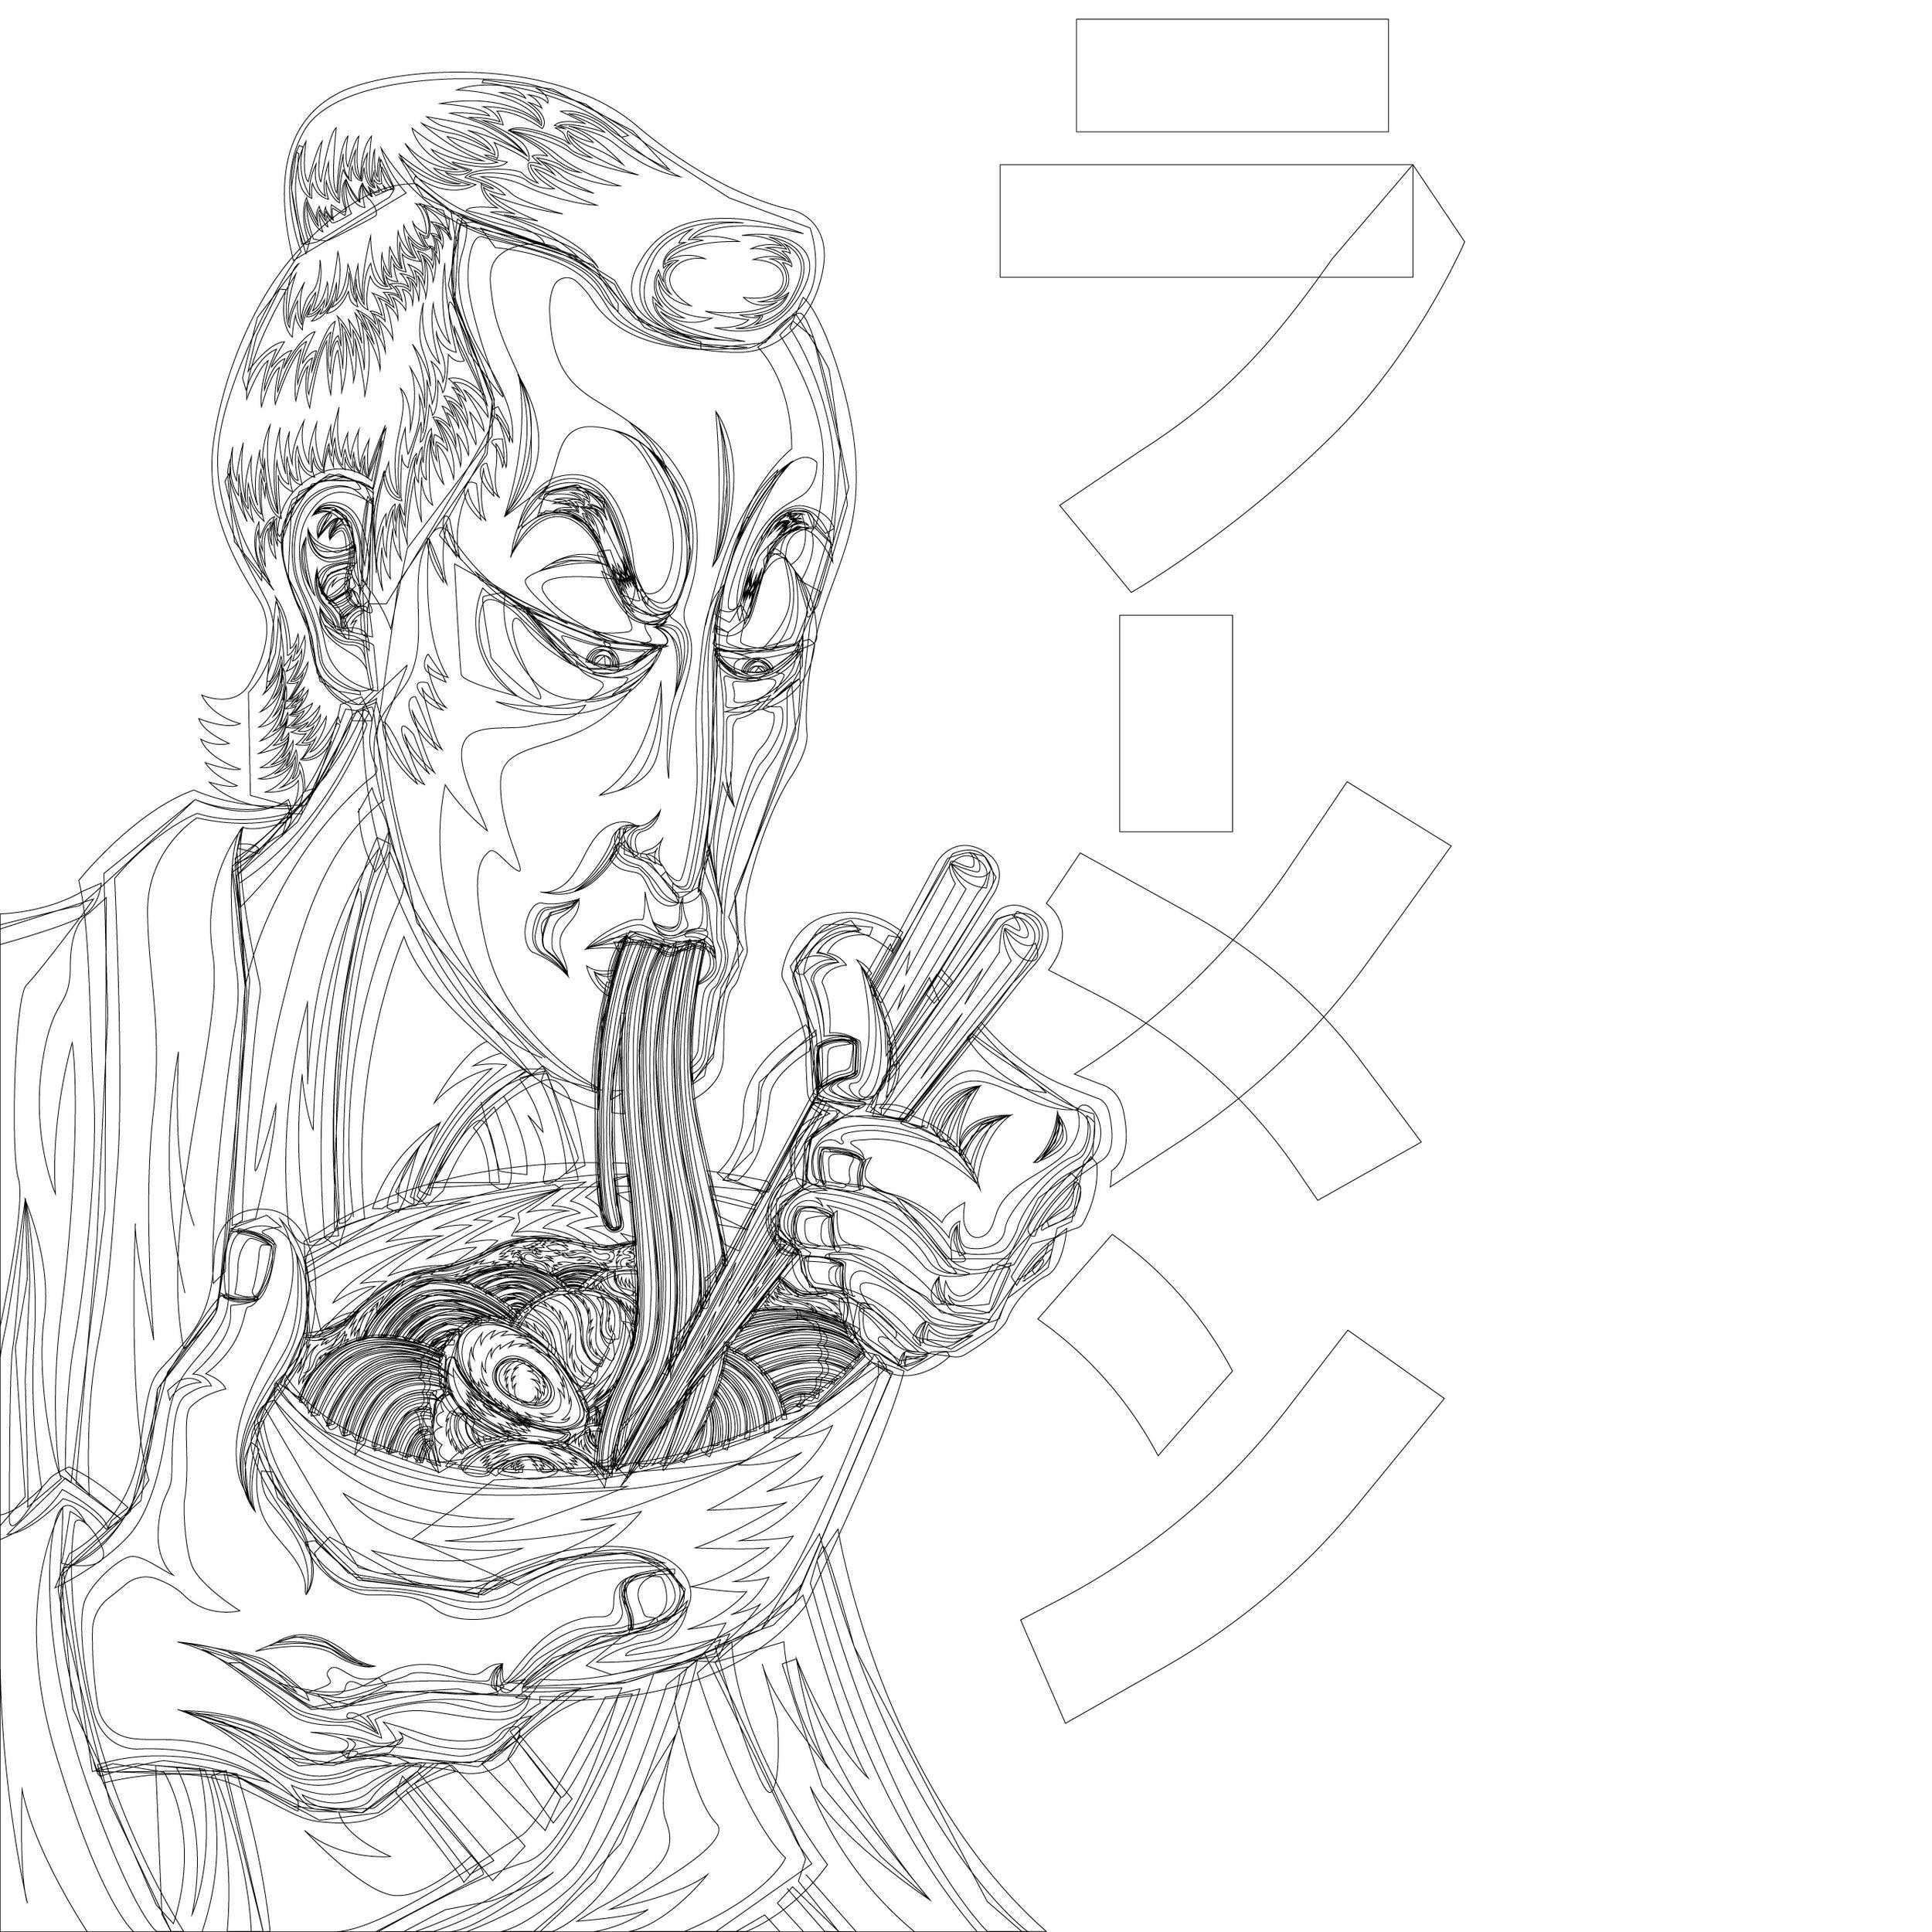 orozcodesign-stickermonster-RamenSamurai-Social_2.jpg